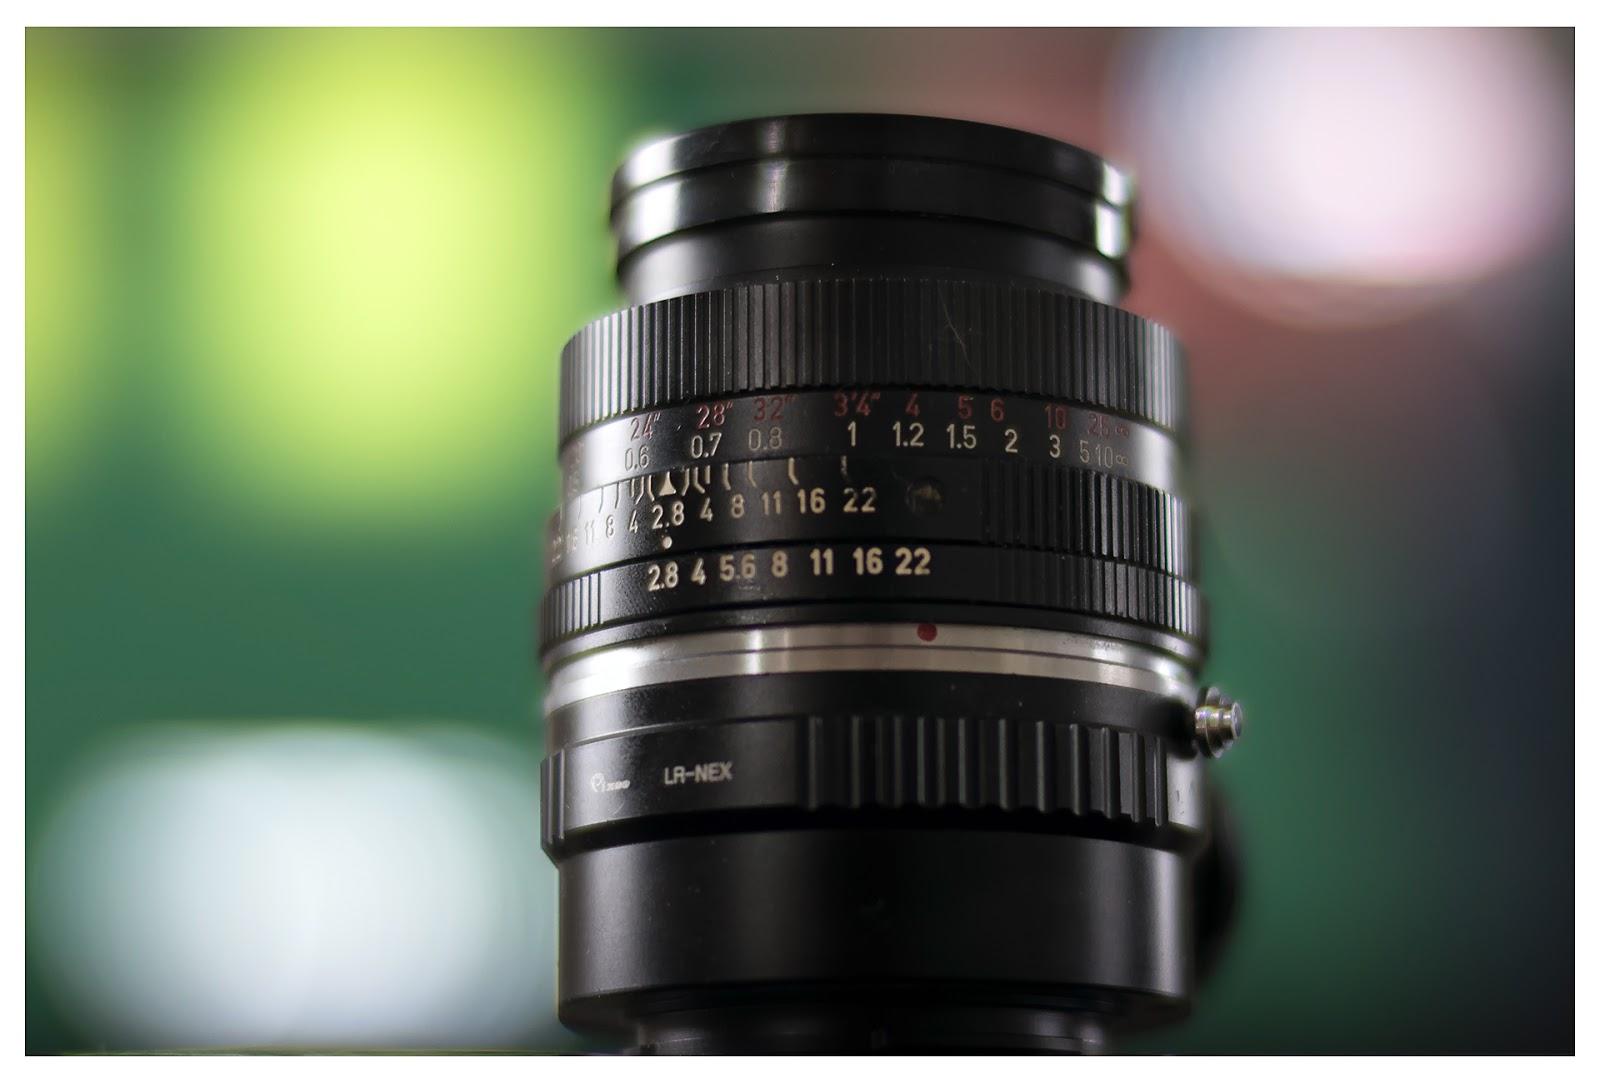 Voigtlander 35mm f 1.2 Nokton III VM | grandangolo